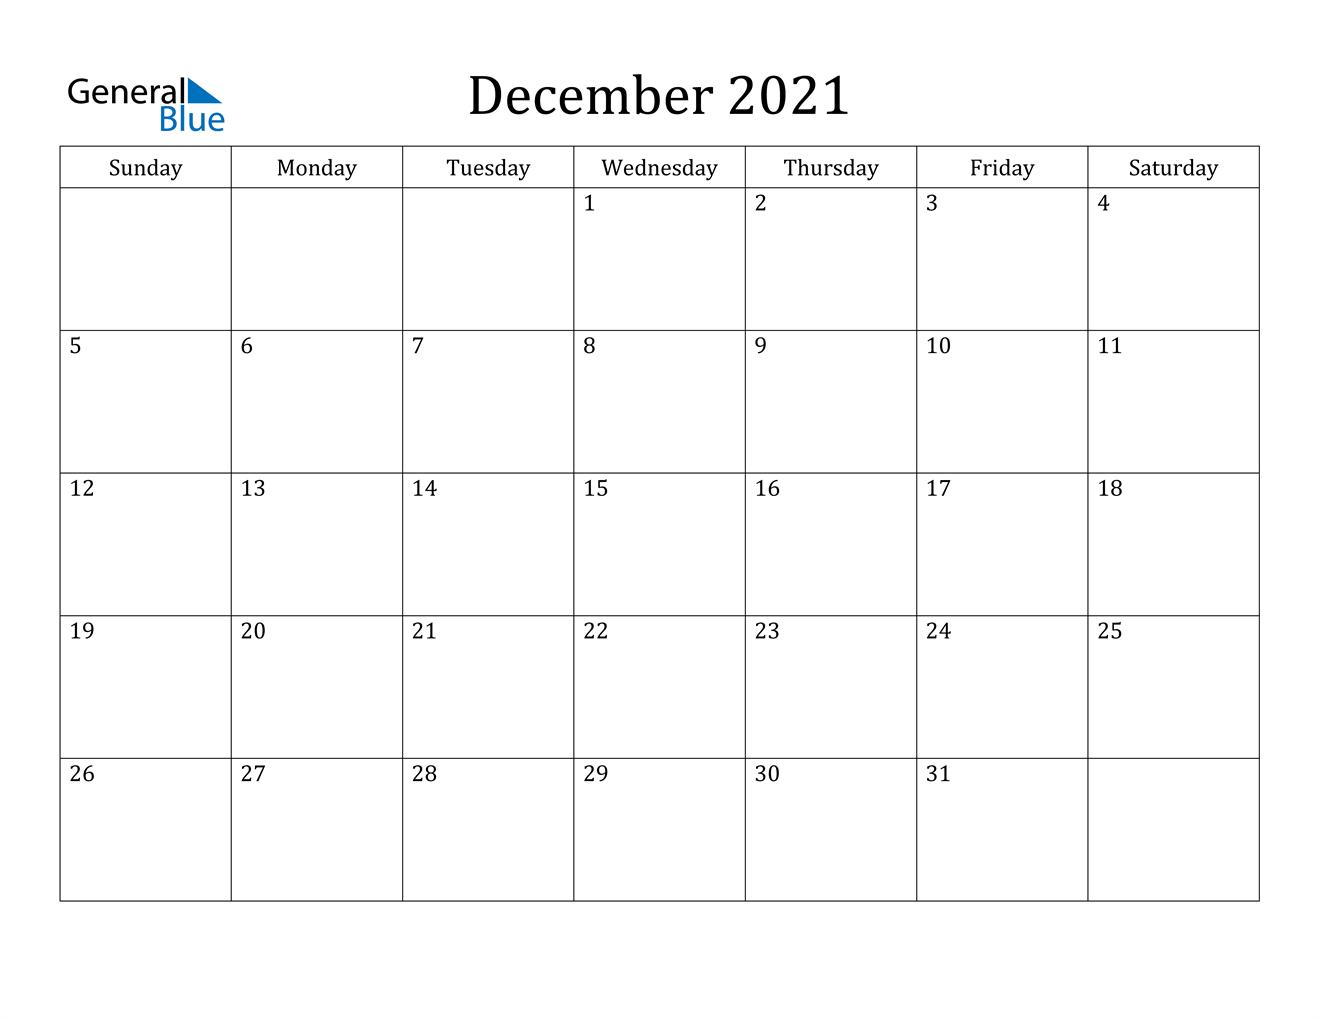 December 2021 Calendar - PDF Word Excel